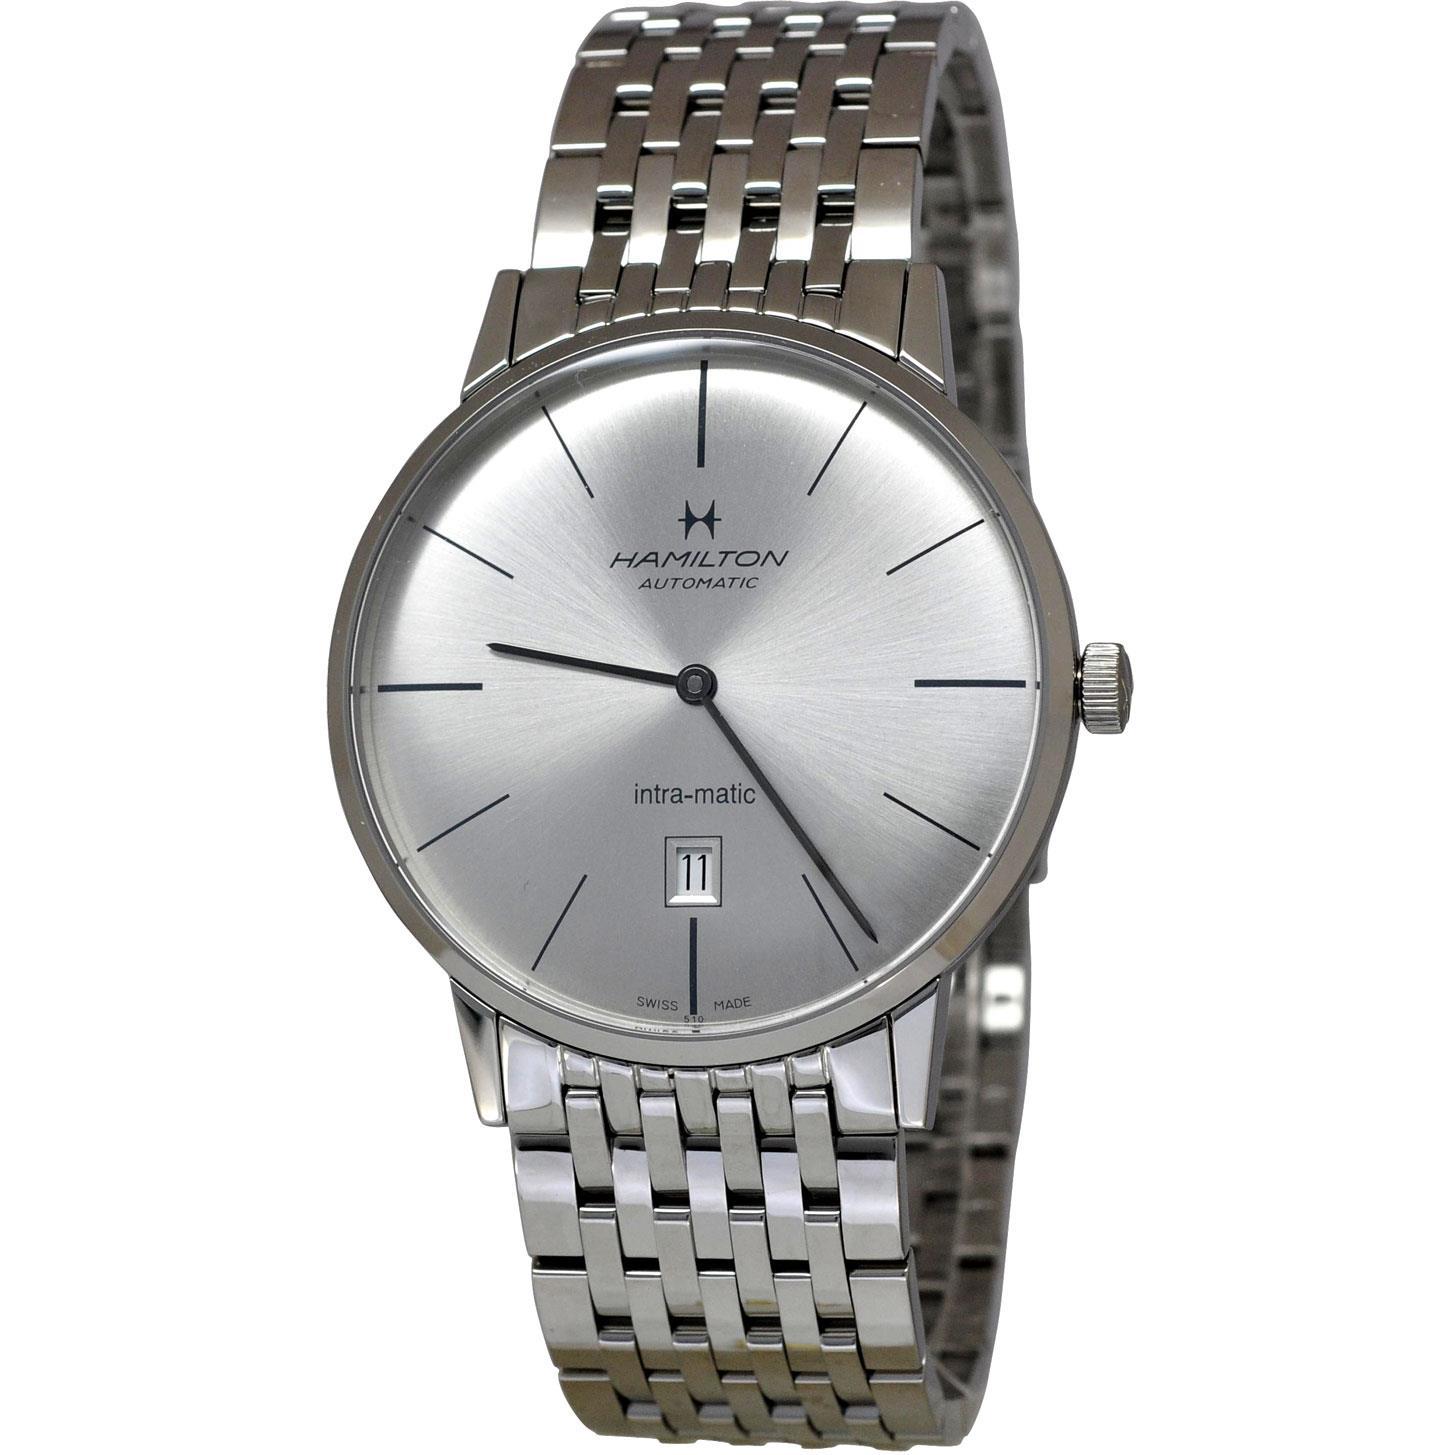 Hamilton Intra-Matic Ultra-Slim Mens Watch H38755151 by Hamilton